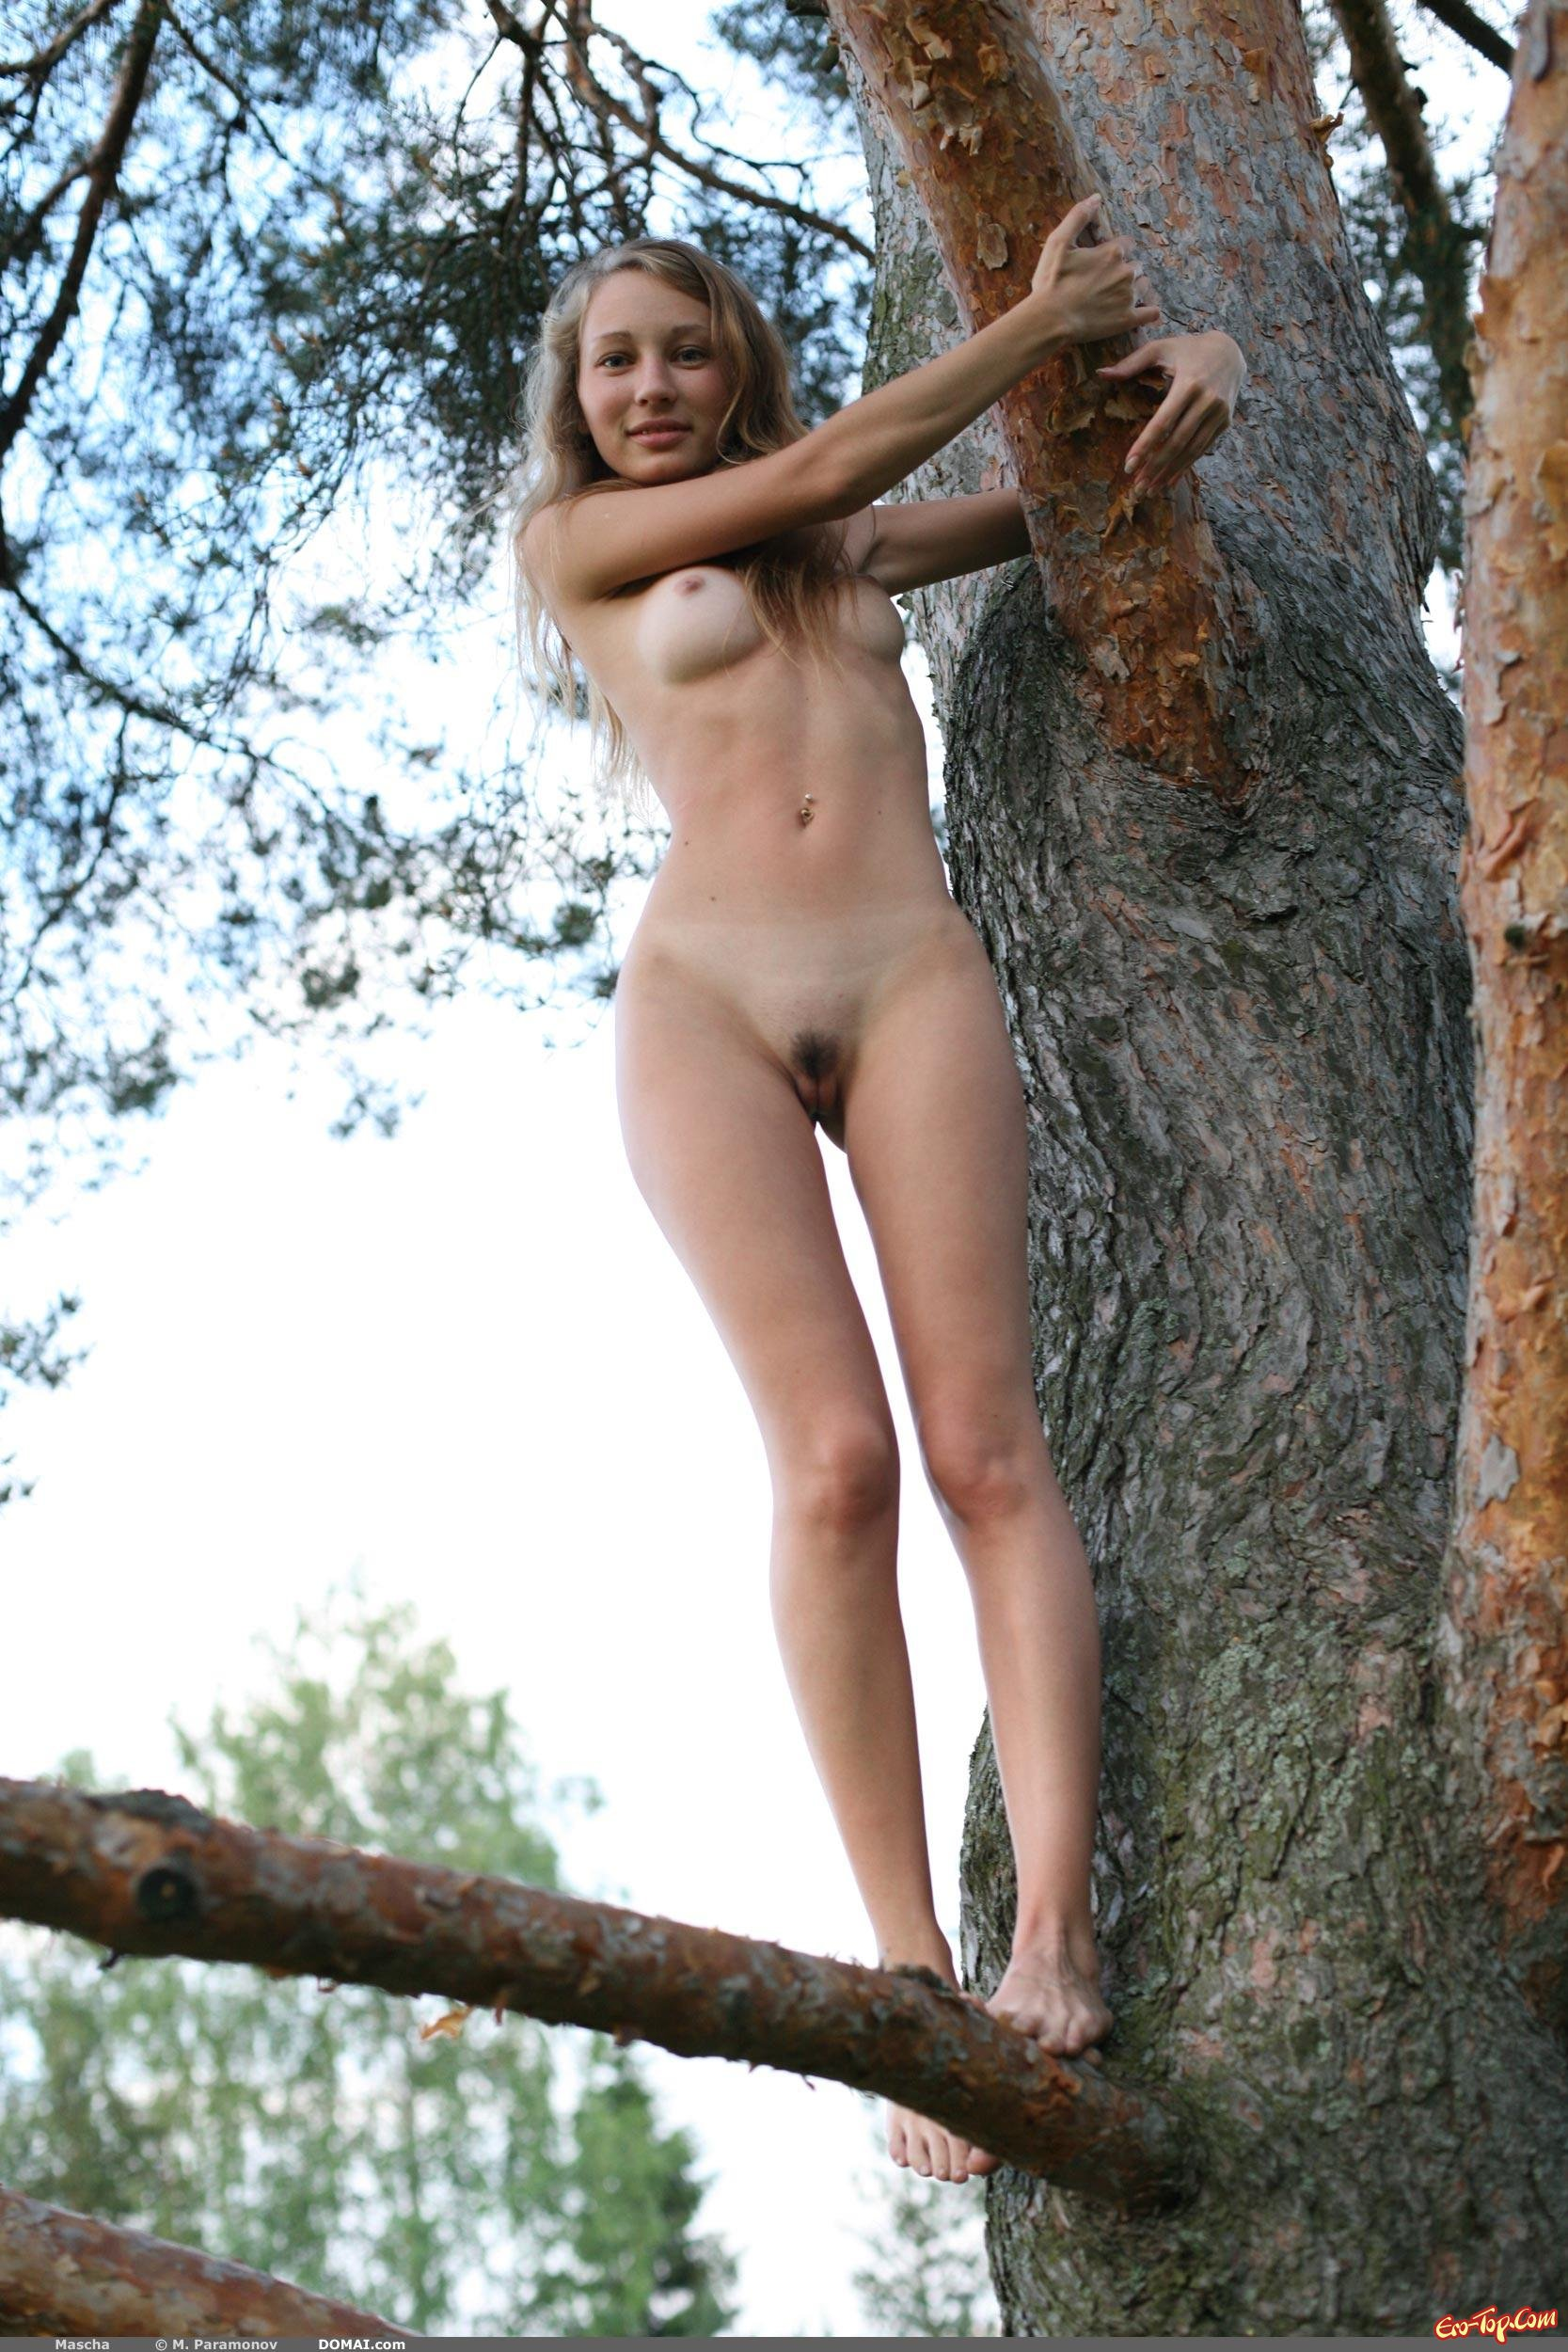 Раздетая на дереве